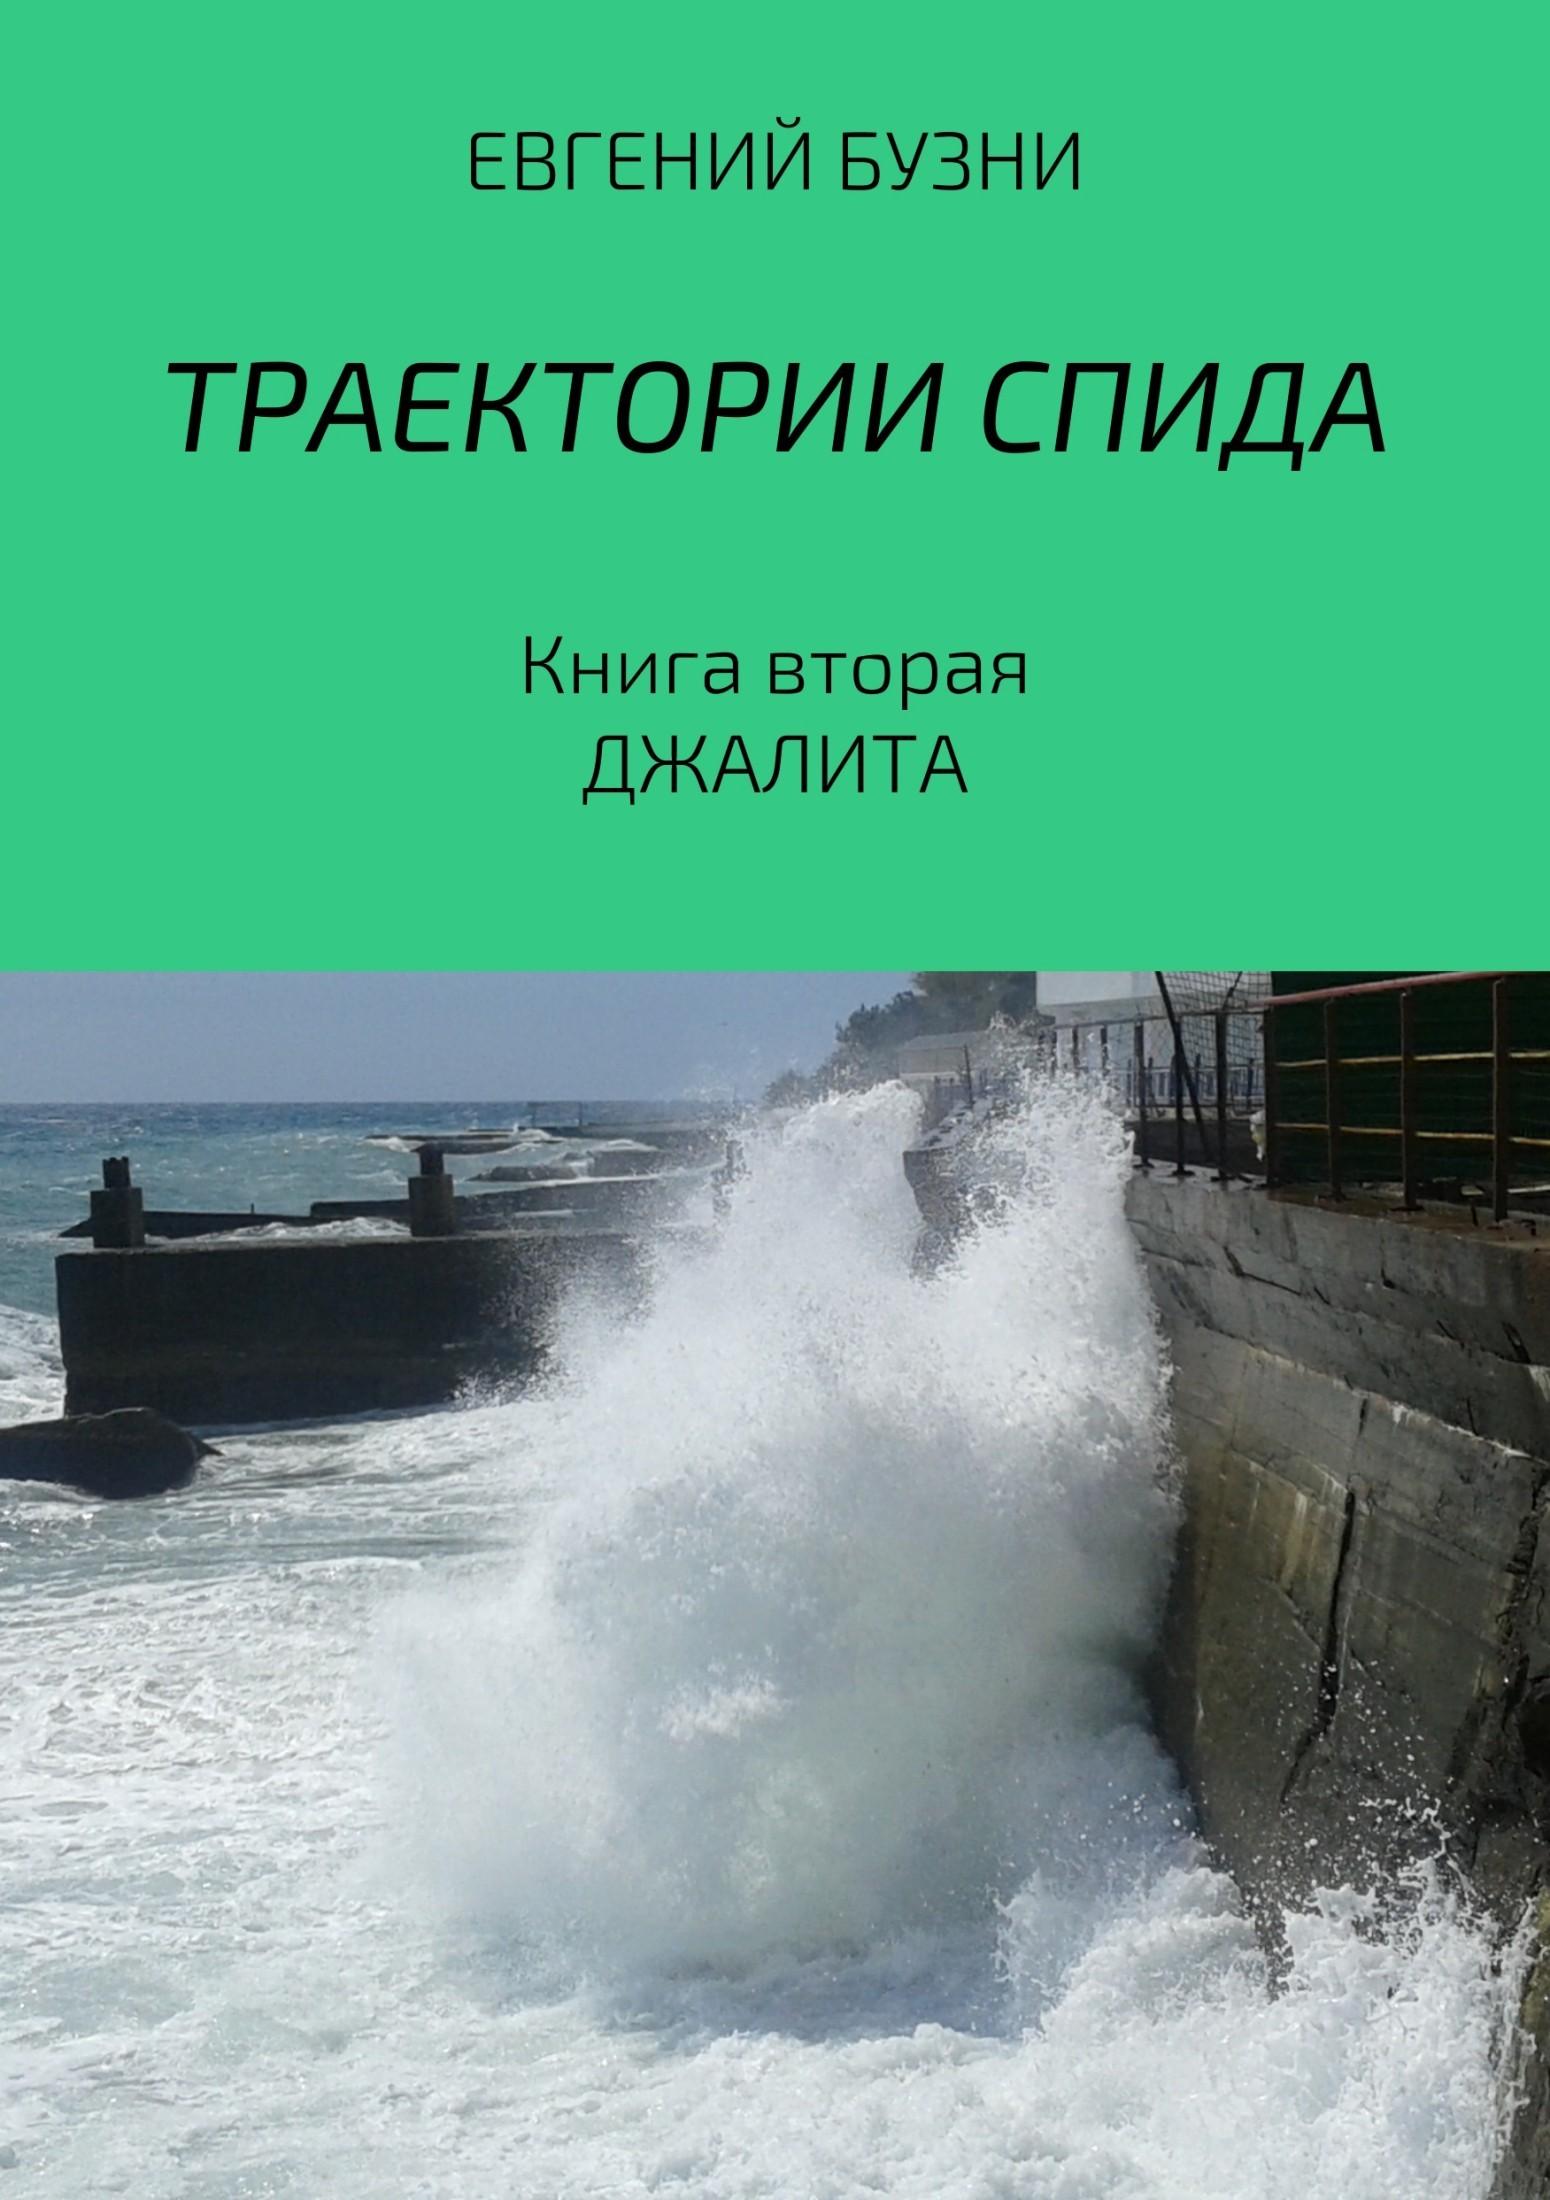 Евгений Николаевич Бузни. Траектории СПИДа. Книга вторая. Джалита